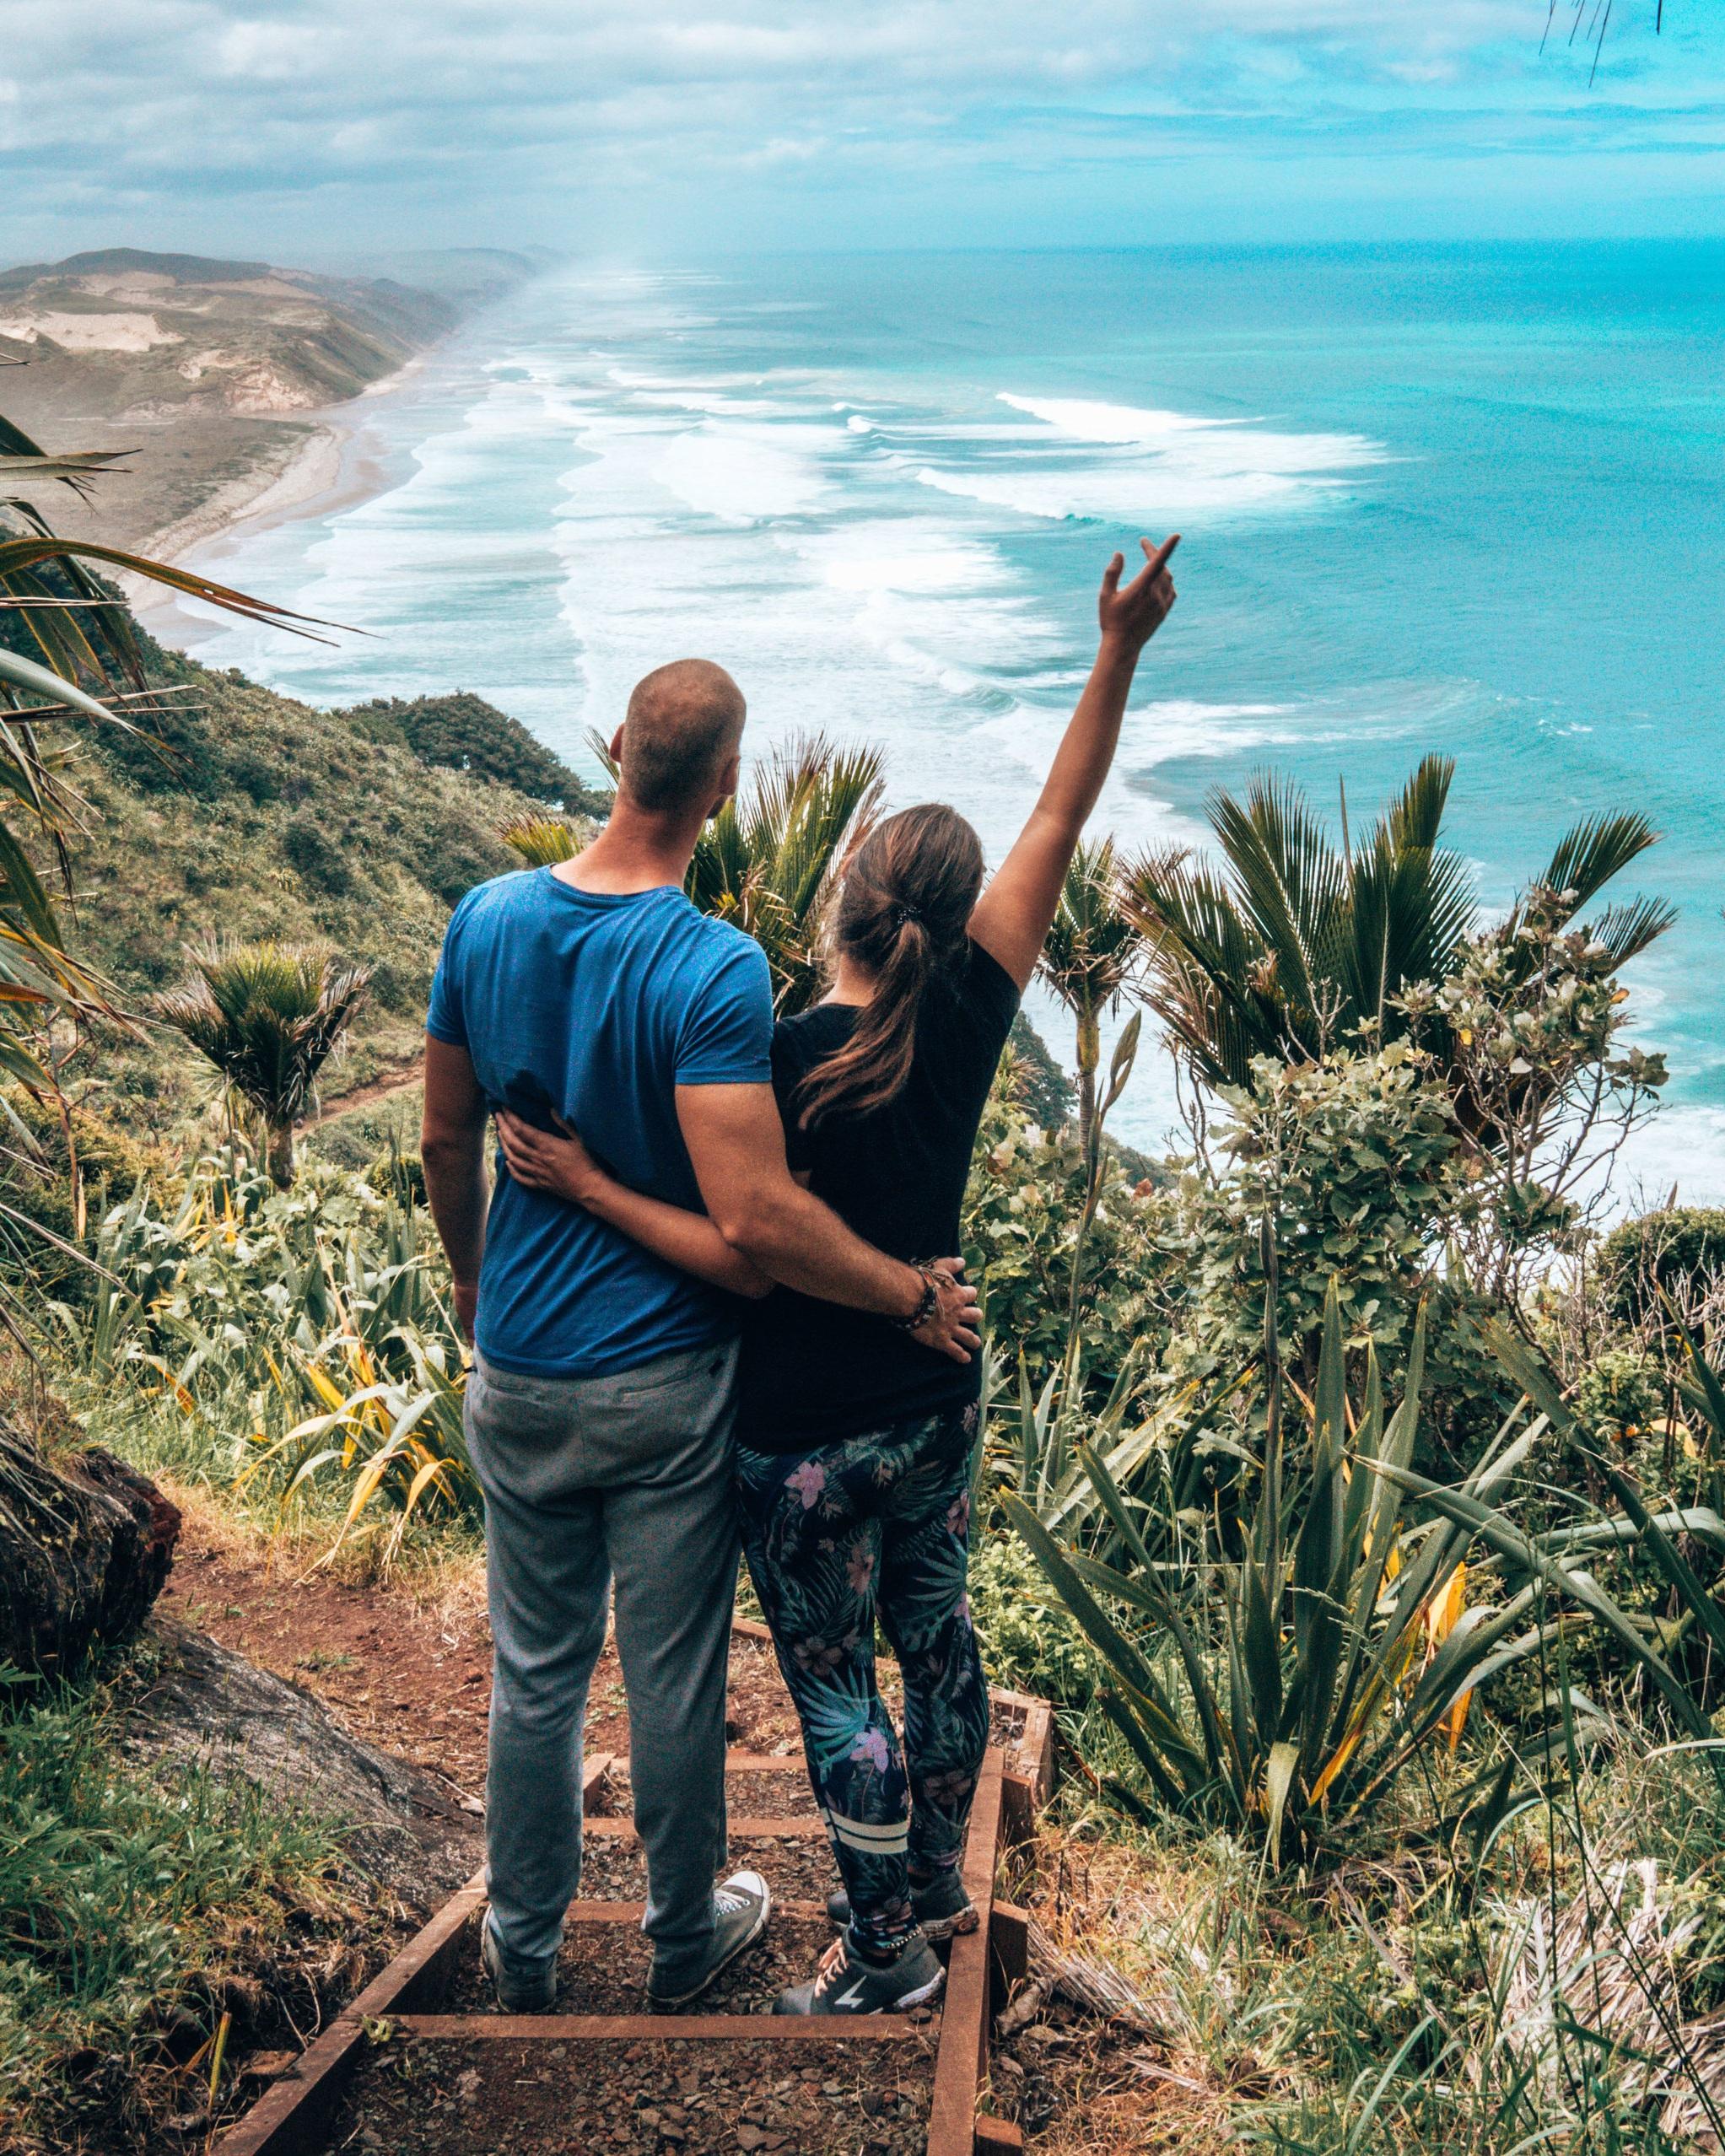 Craving Adventure - New Zealand - Travel - Adventure - Couple - View - Beach - Blog - Hike